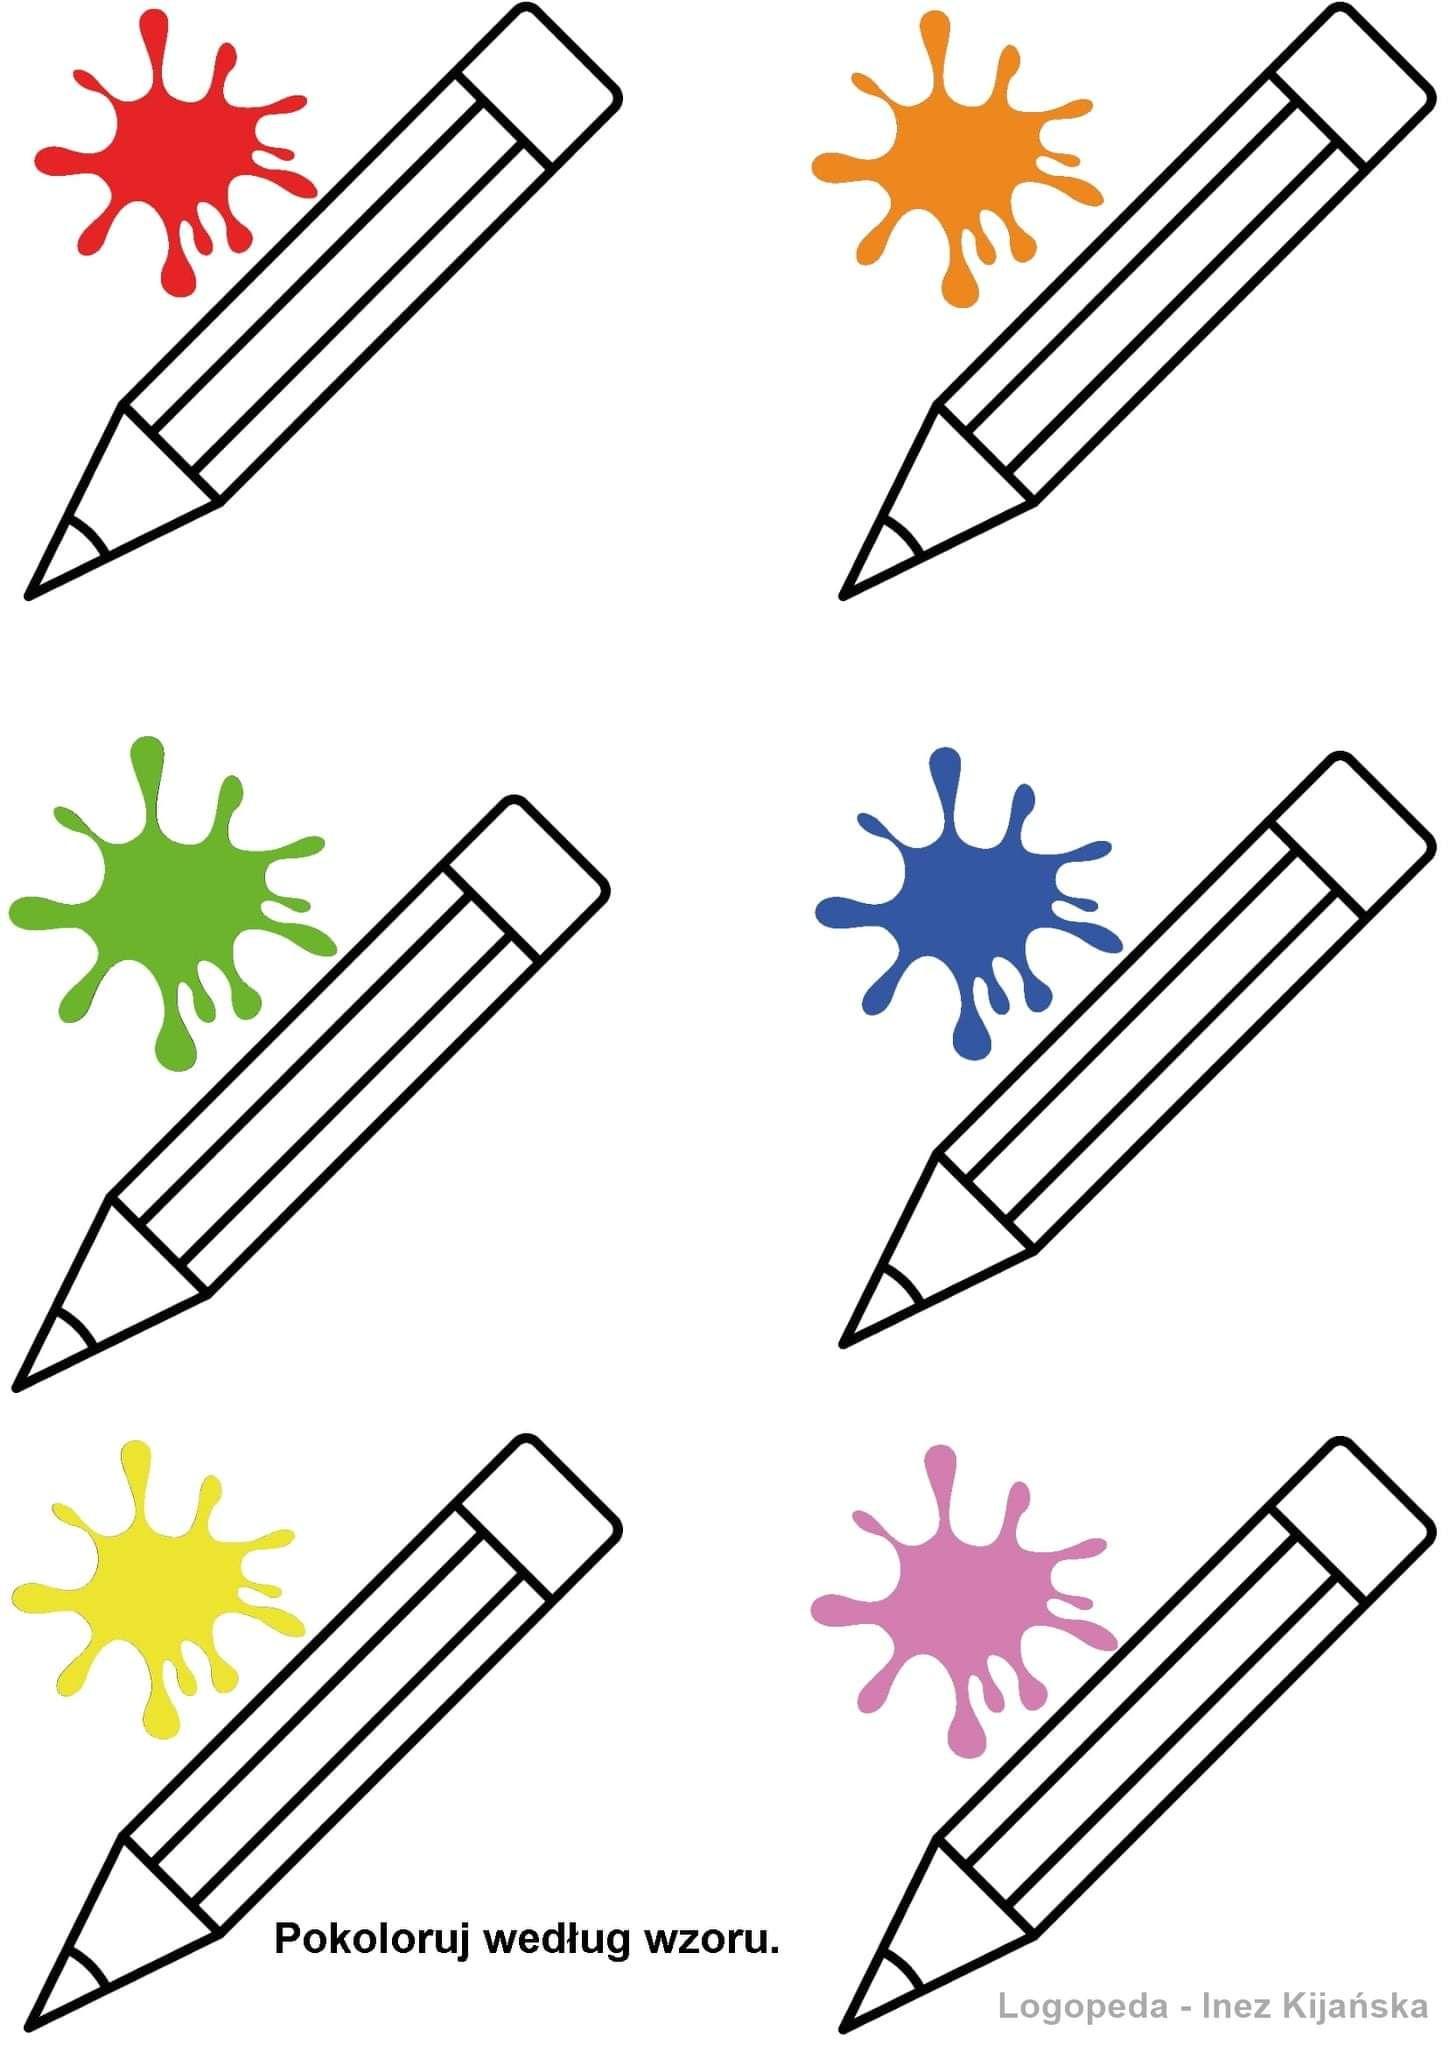 Pin By Ilona Kucharczyk On Przedszkole In 2020 Book Activities School Organization Childhood Education